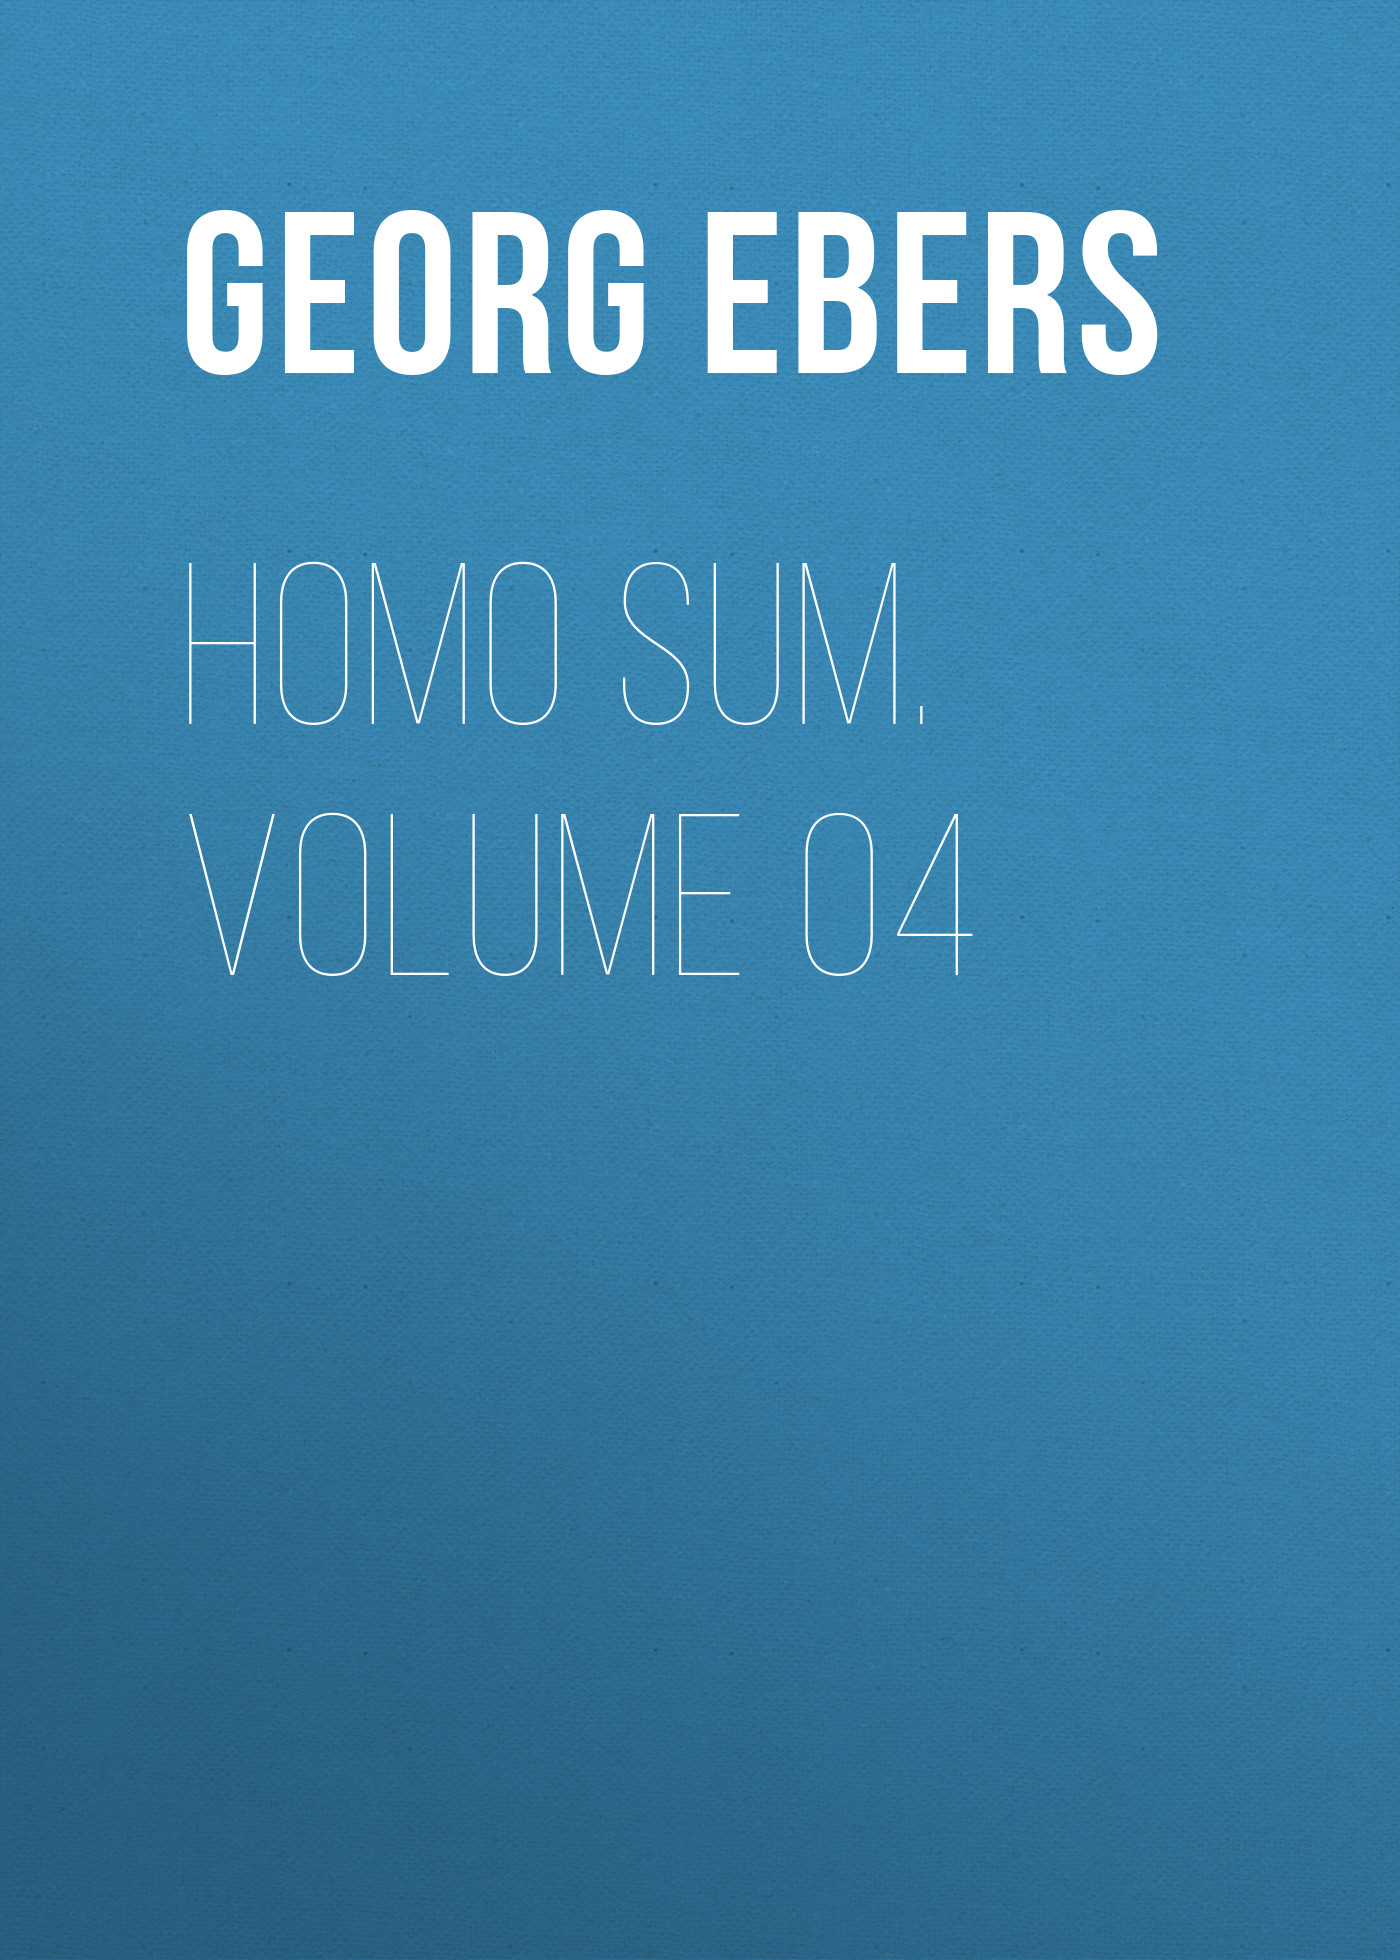 Georg Ebers Homo Sum. Volume 04 georg ebers homo sum volume 02